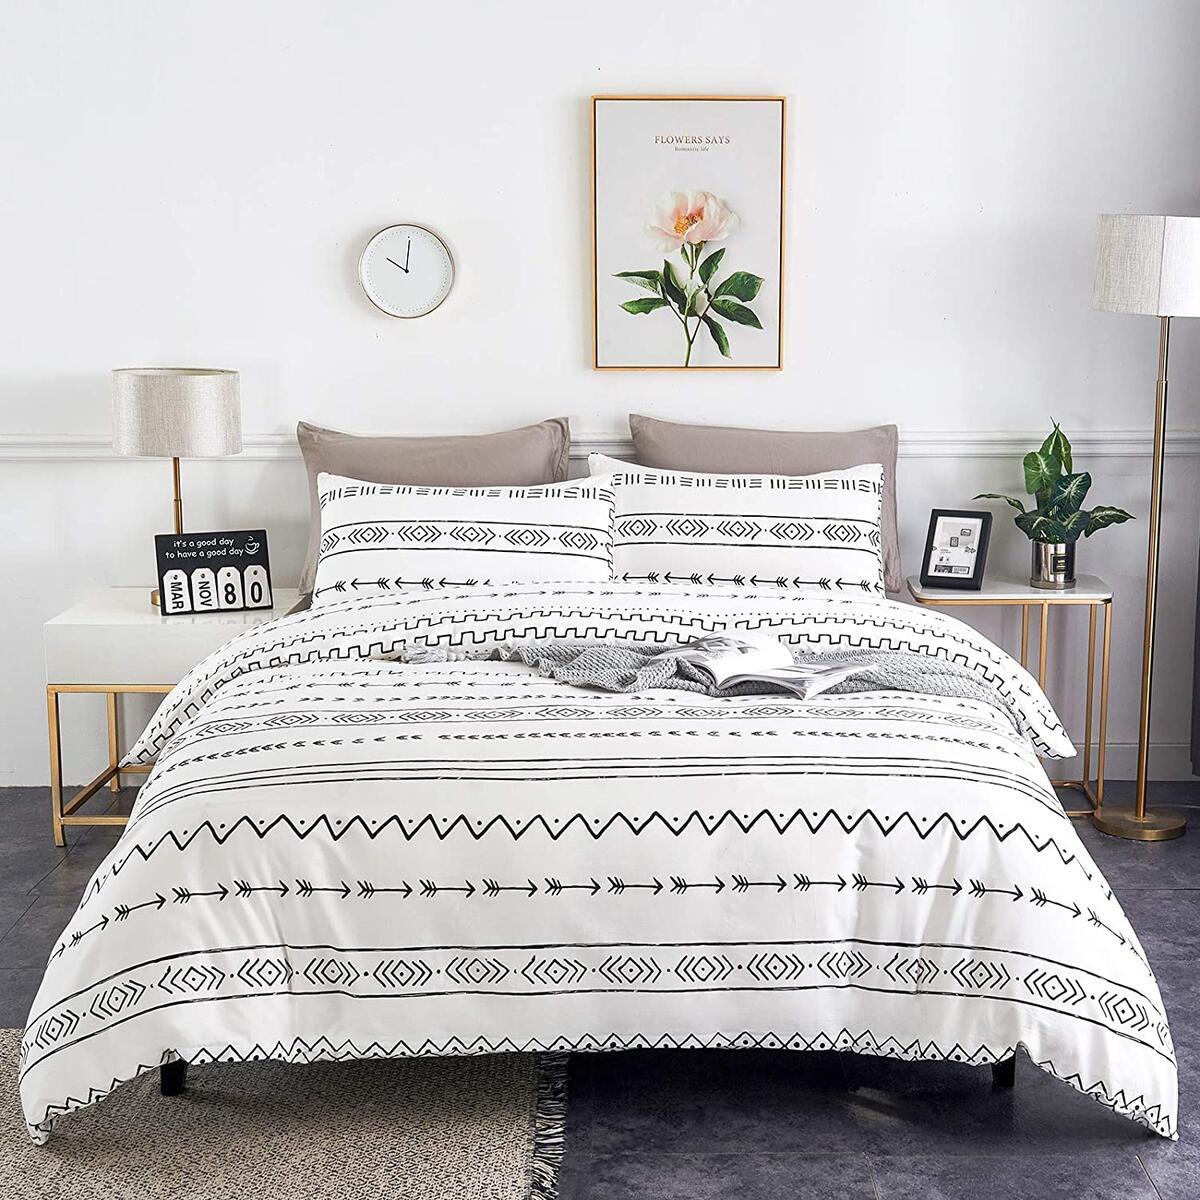 WARMDERN Black Stripe Boho Duvet Cover Set King, 3pcs Ultra Soft Breathable Aztec Cotton Comforter Cover with Zipper Ties, 1 Bohemian White Duvet Cover & 2 Pillowcase(King,White)